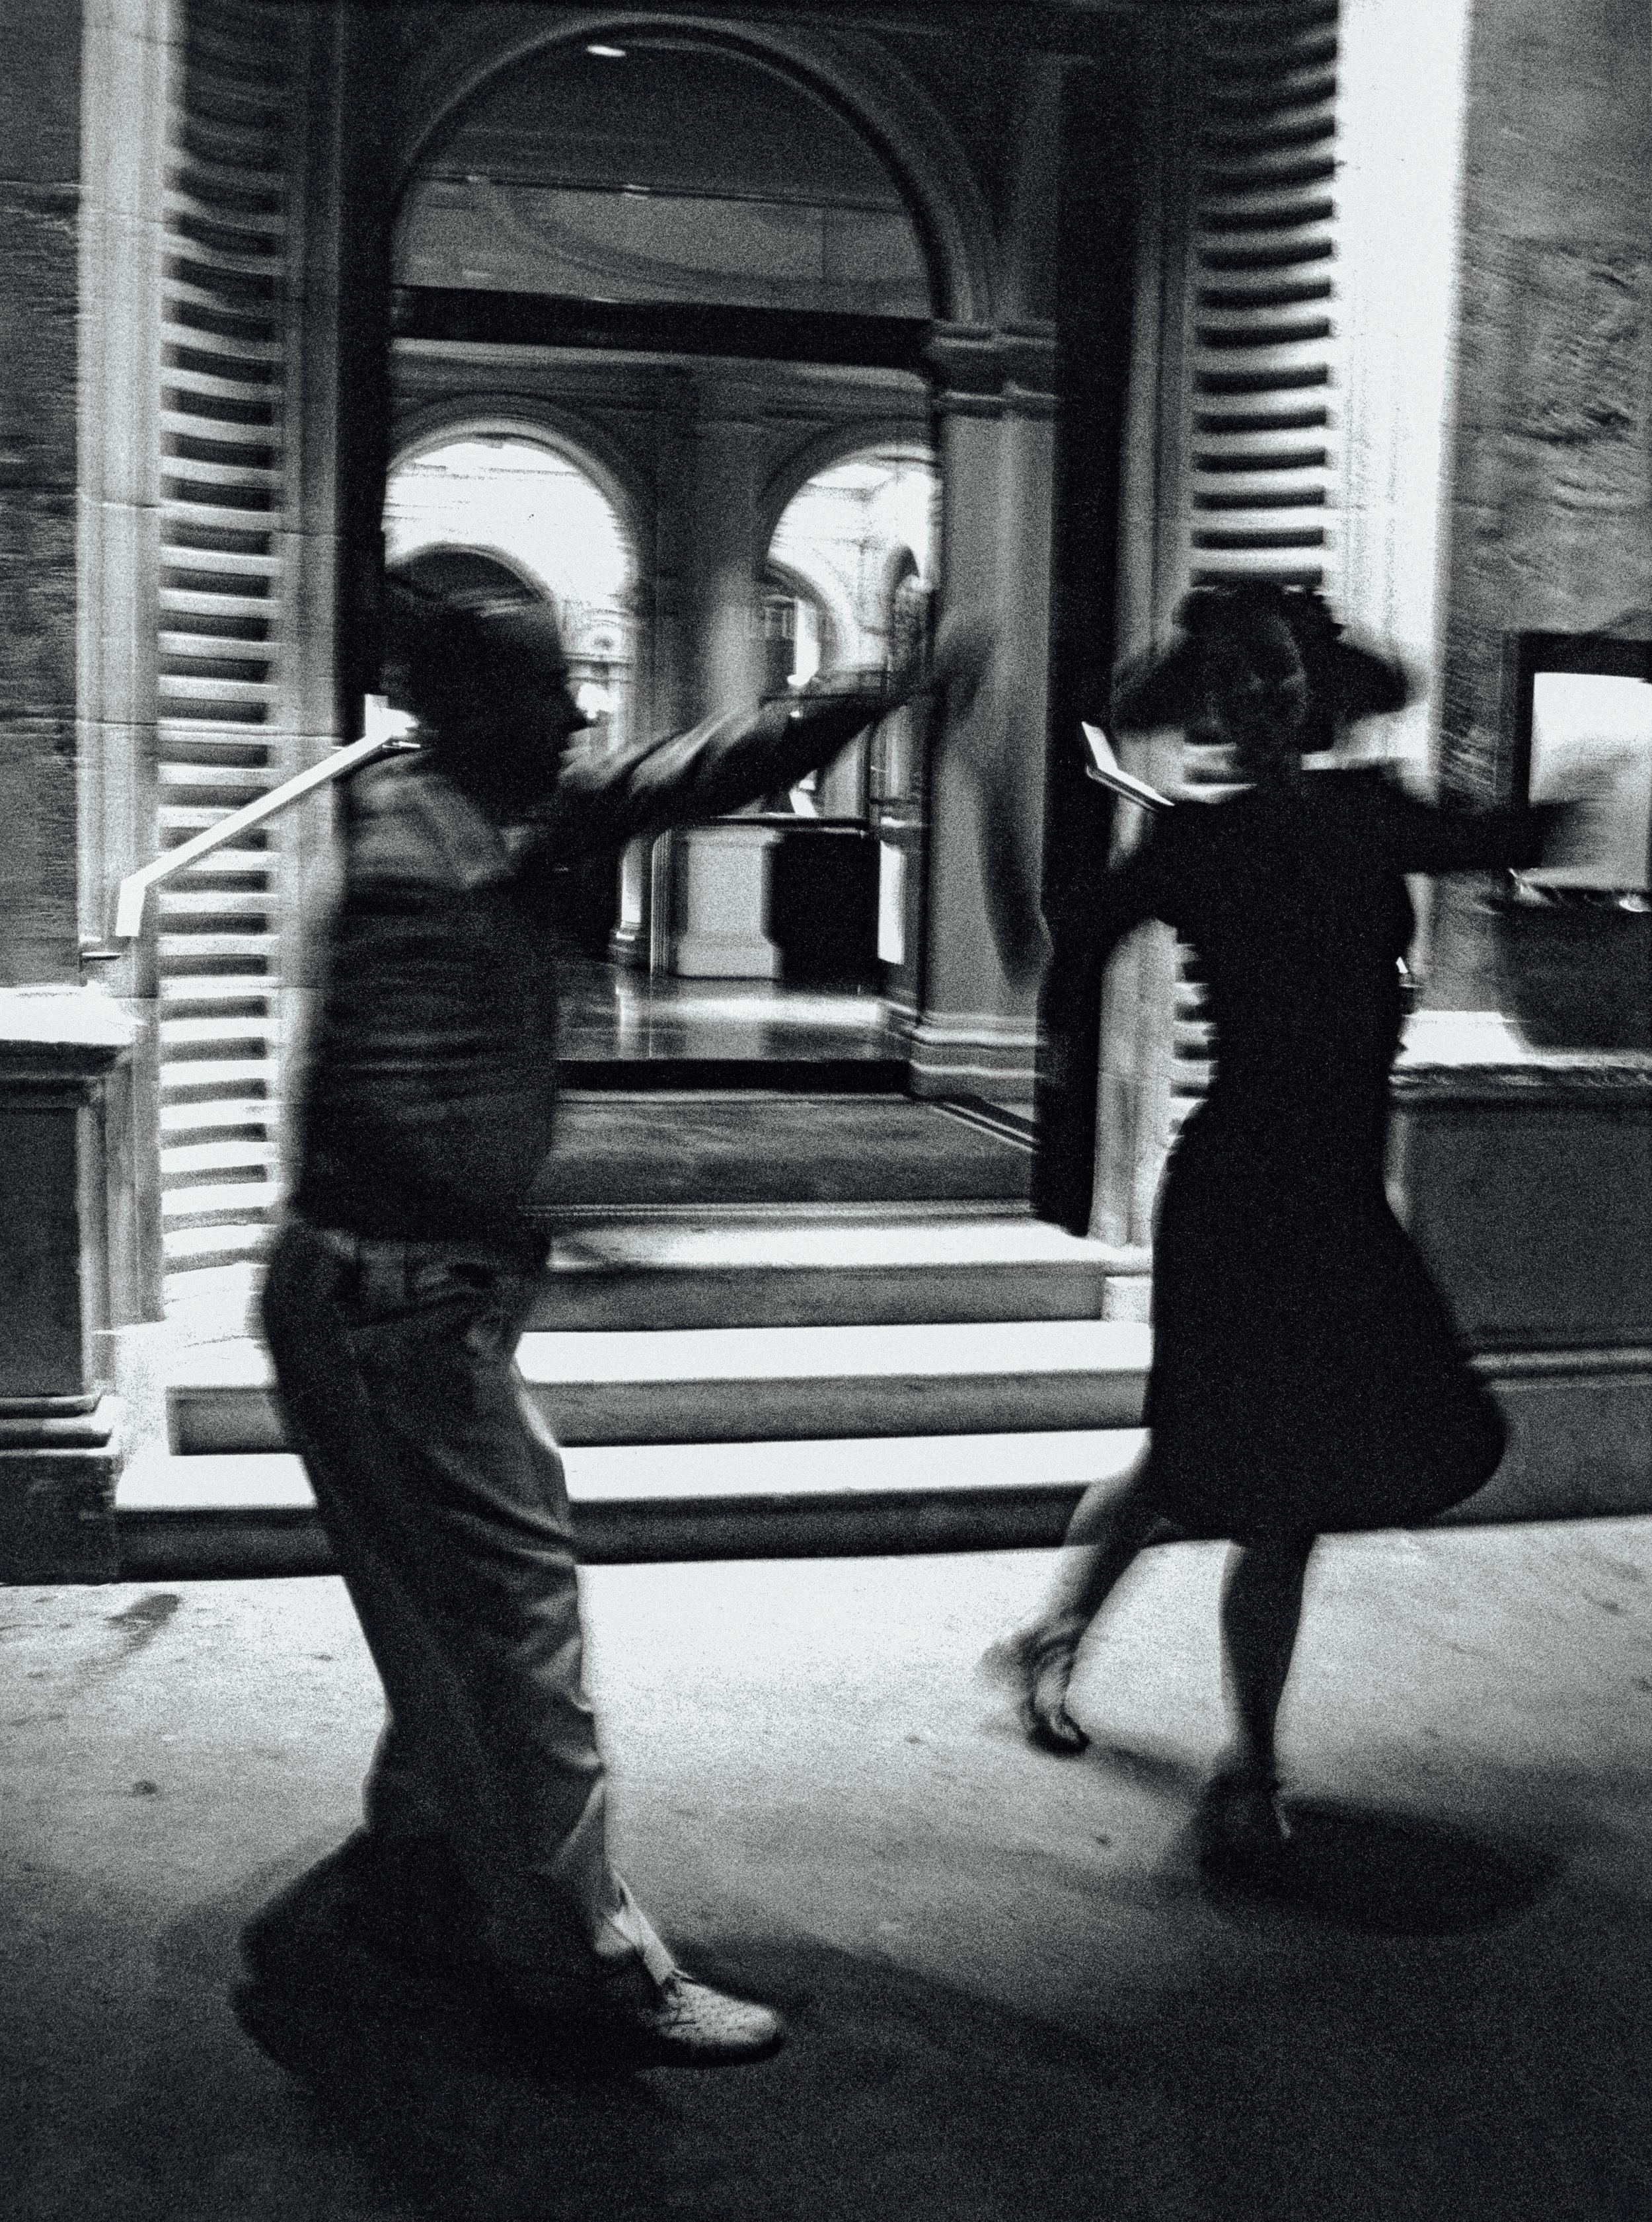 Dancers in the street, Great Eastern Hotel 2005